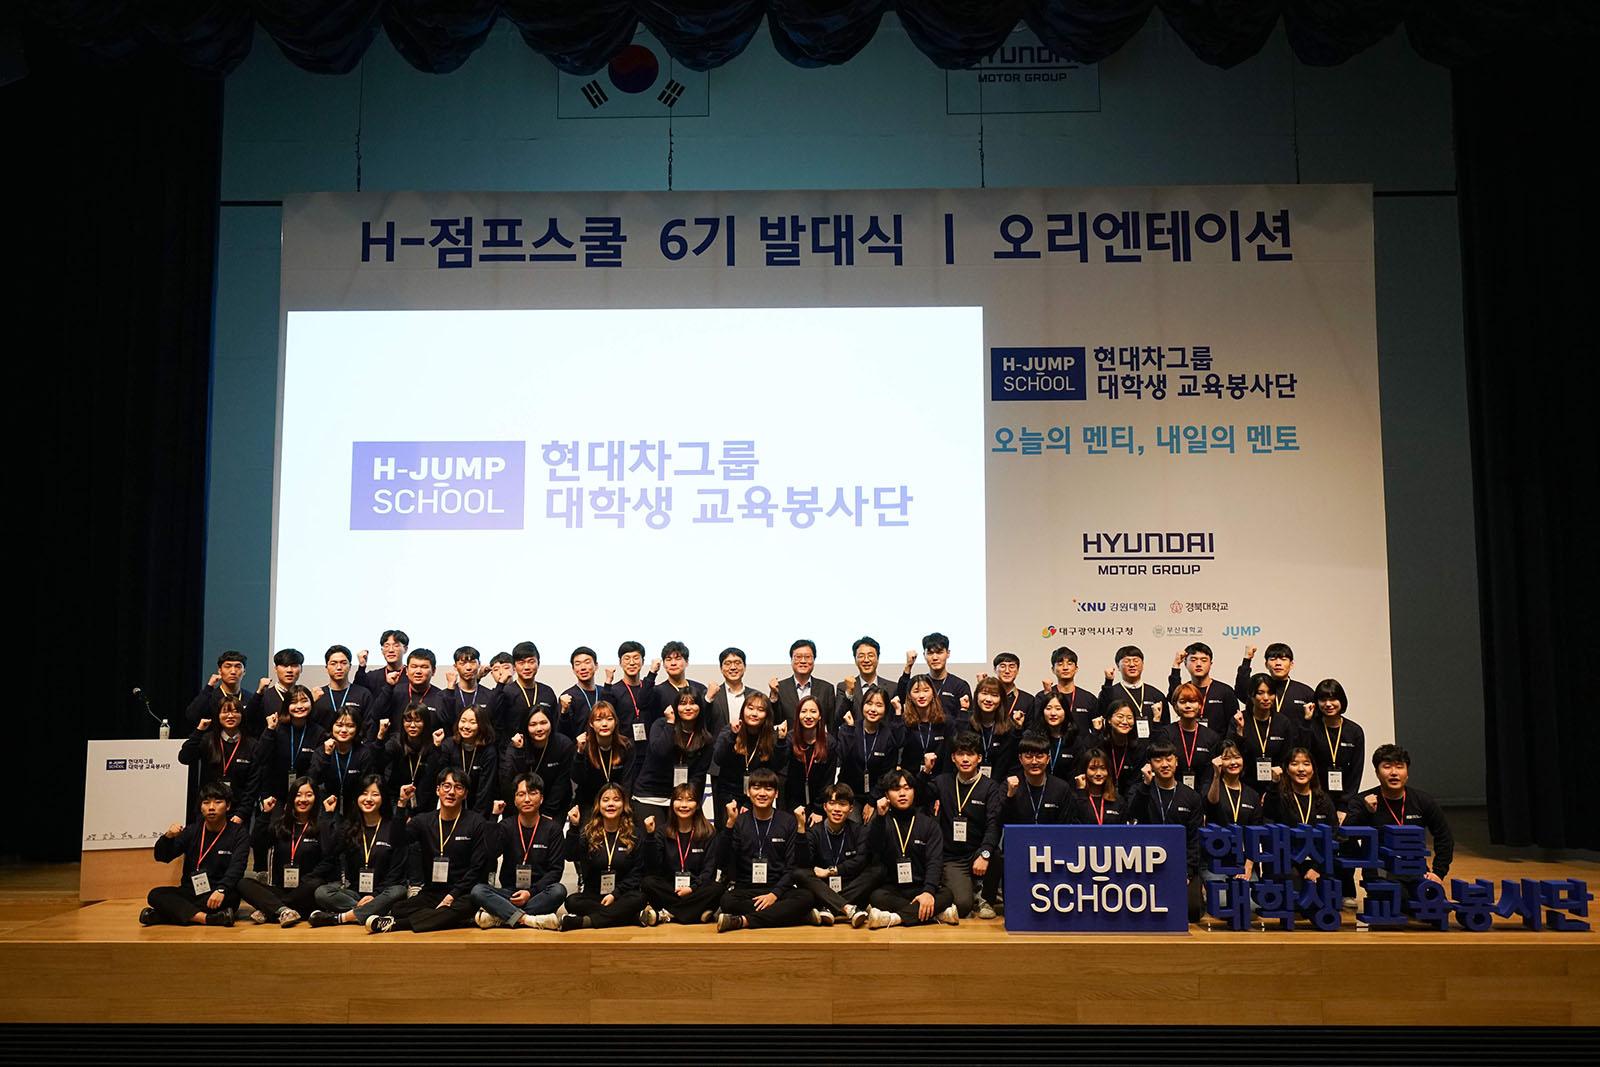 H-Jump School Hyundai